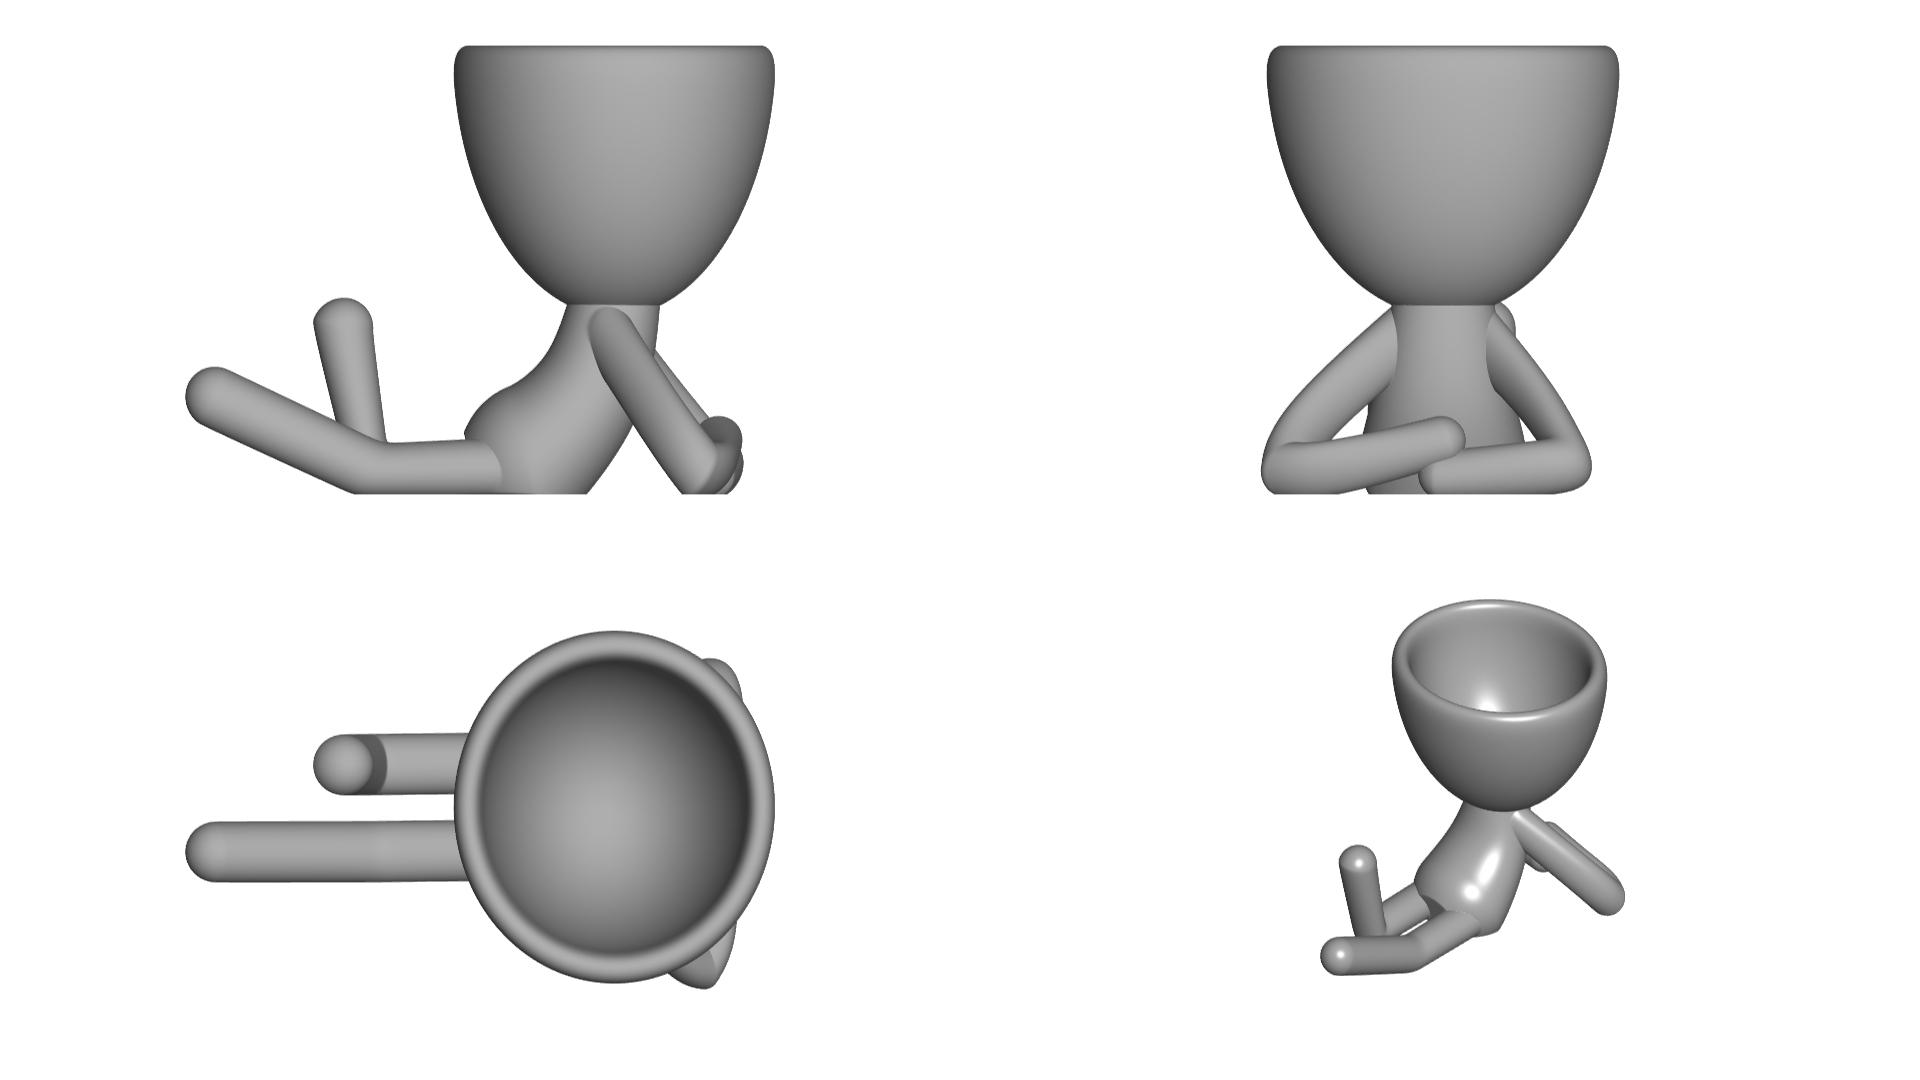 Vaso_02_Gris_2.jpg Download free STL file JARRÓN MACETA ROBERT 02 - VASE FLOWERPOT ROBERT 02 • 3D print model, PRODUSTL56